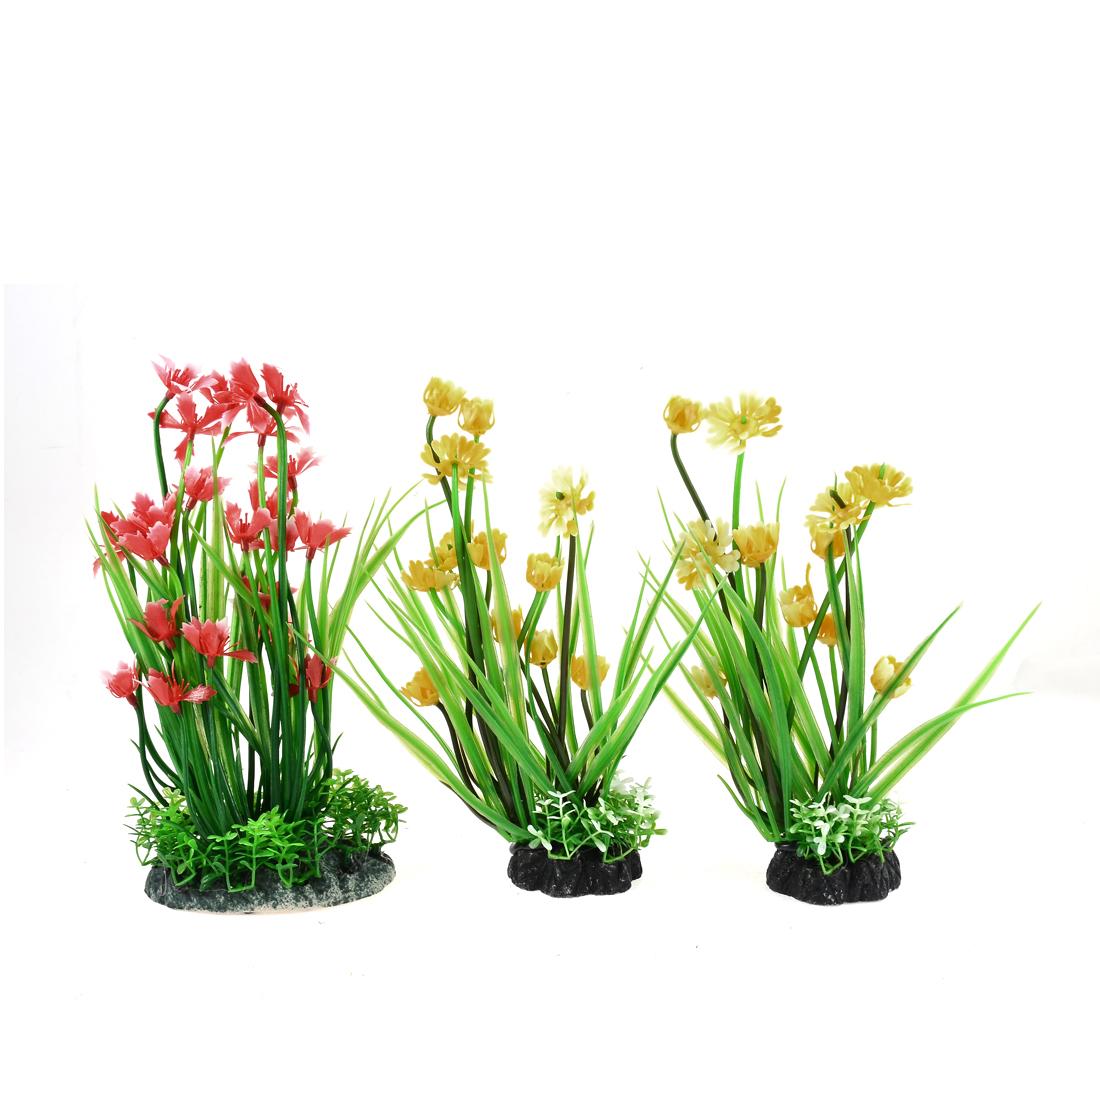 Fish Tank Aquarium Plastic Artificial Water Plant Grass Flower 22cm Height 3pcs